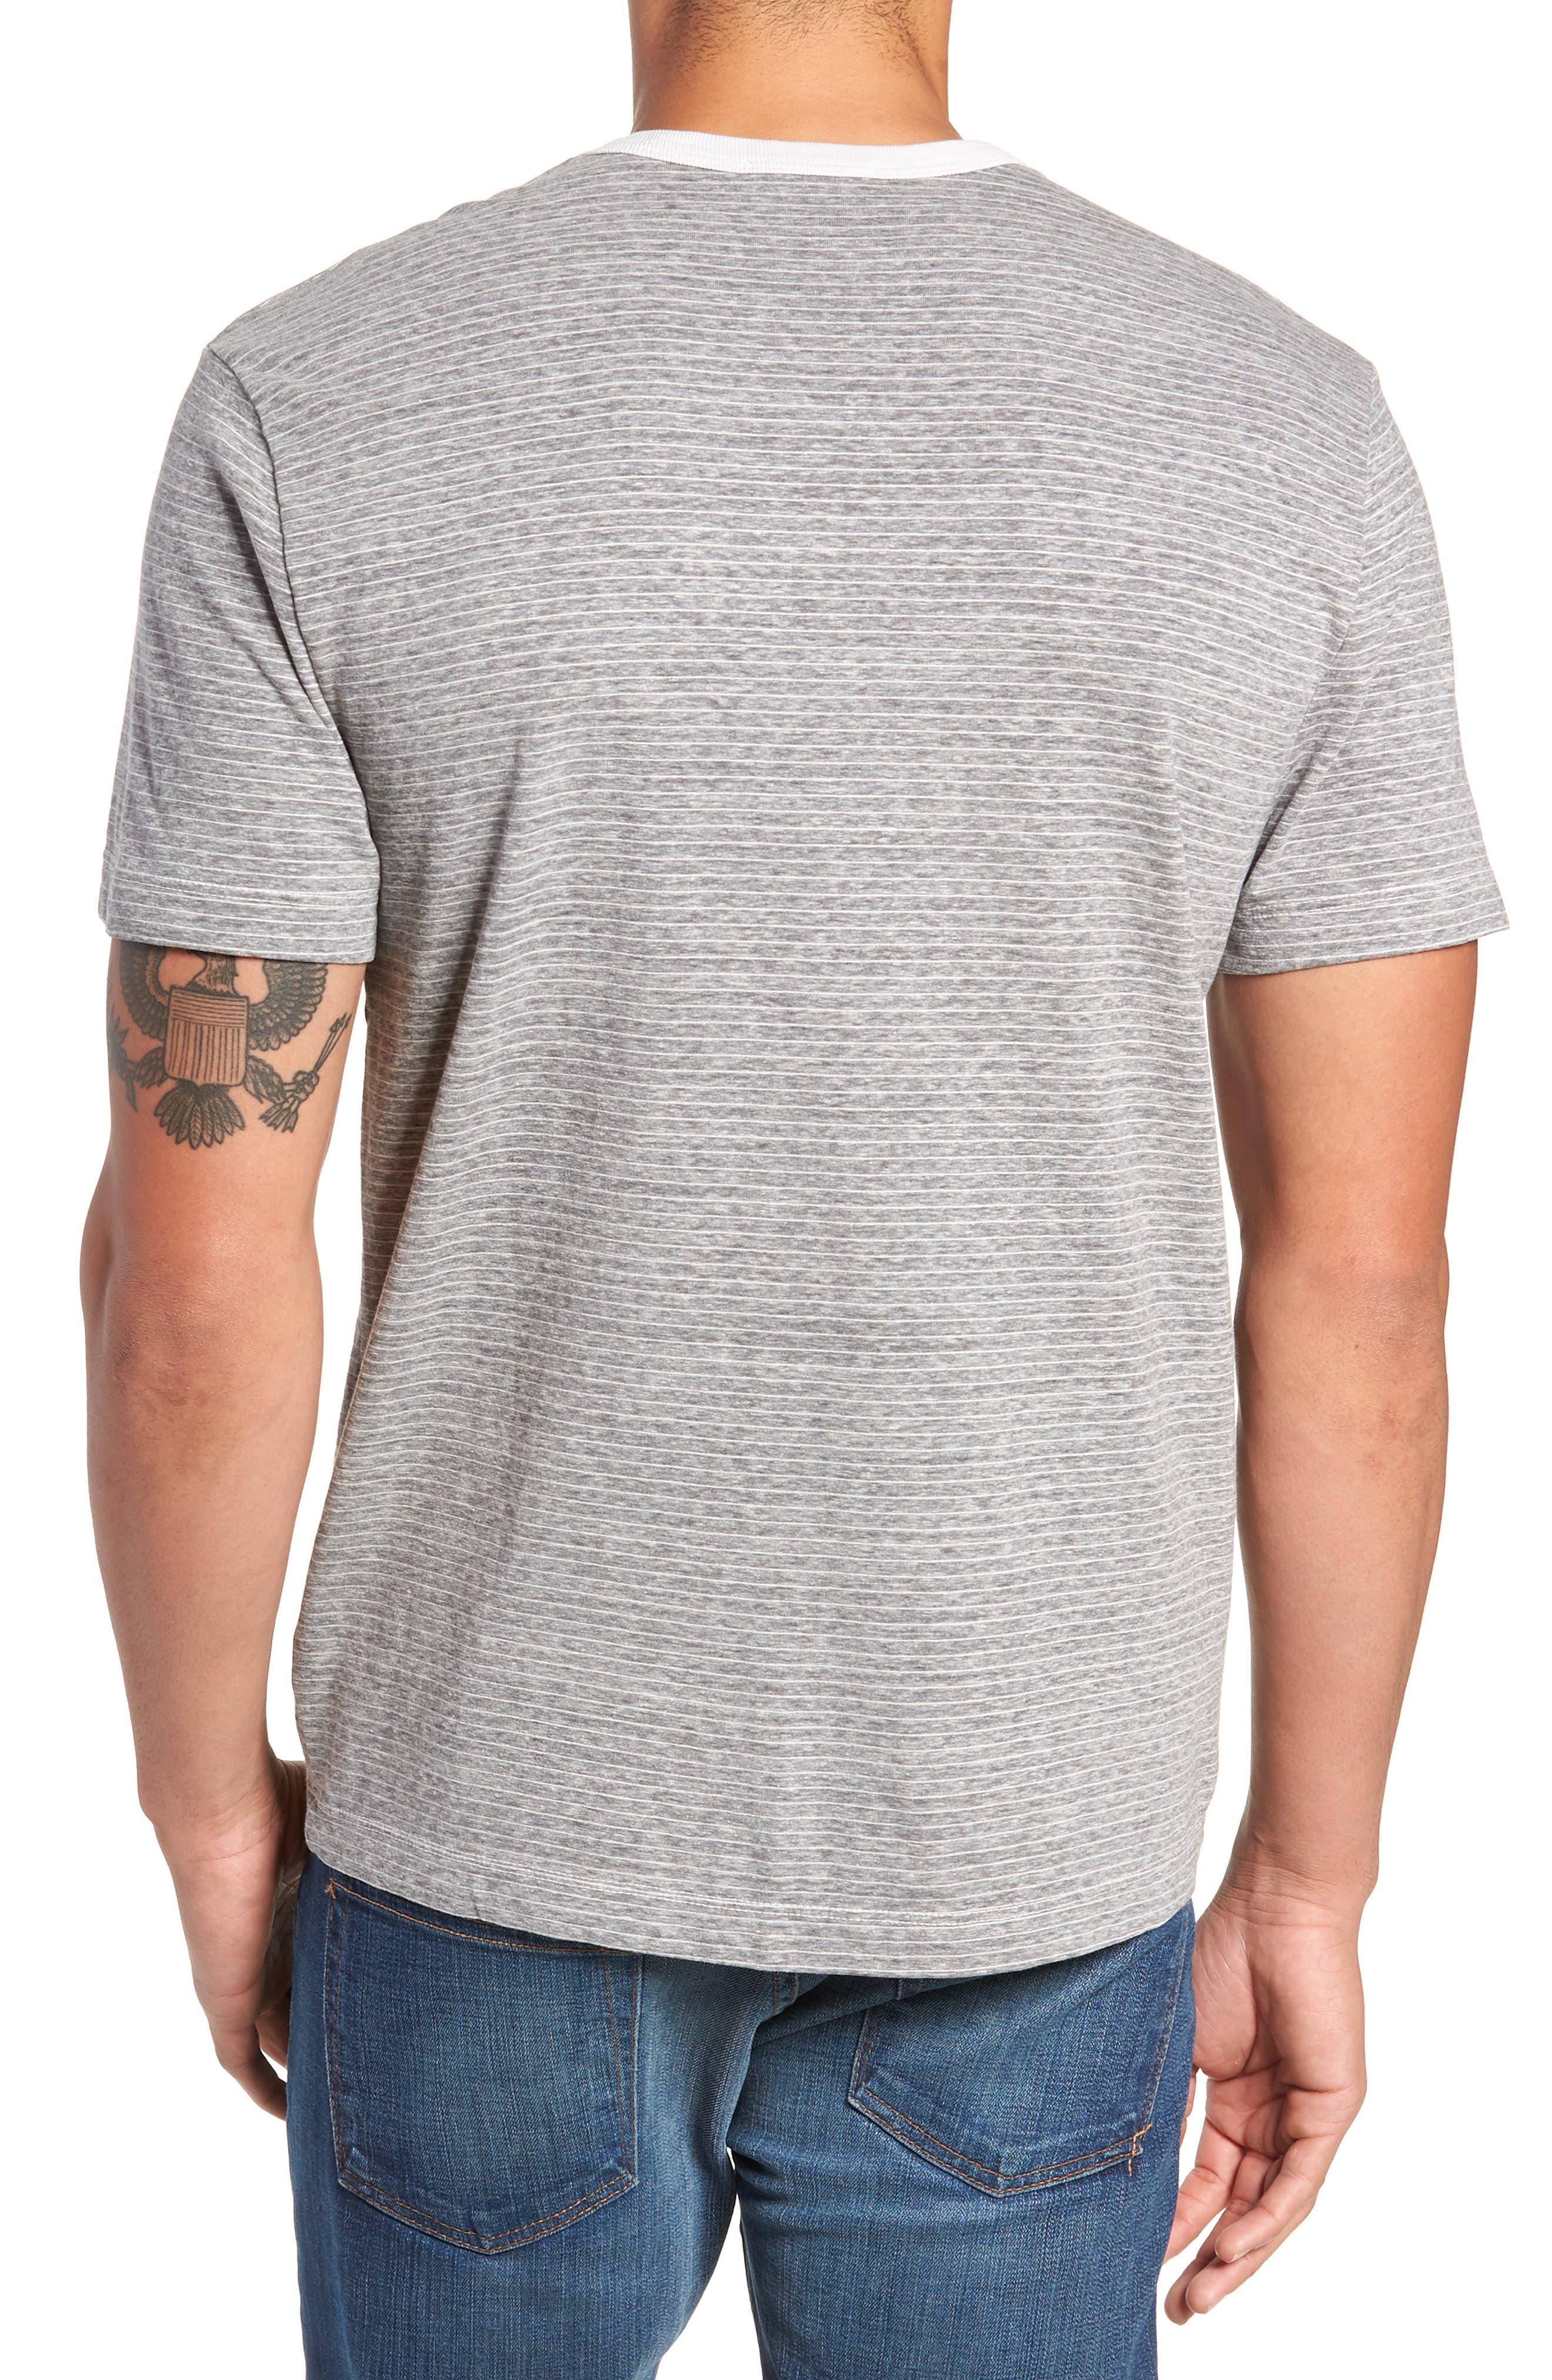 Microstripe Ringer T-Shirt,                             Alternate thumbnail 2, color,                             MEMORY PIGMENT